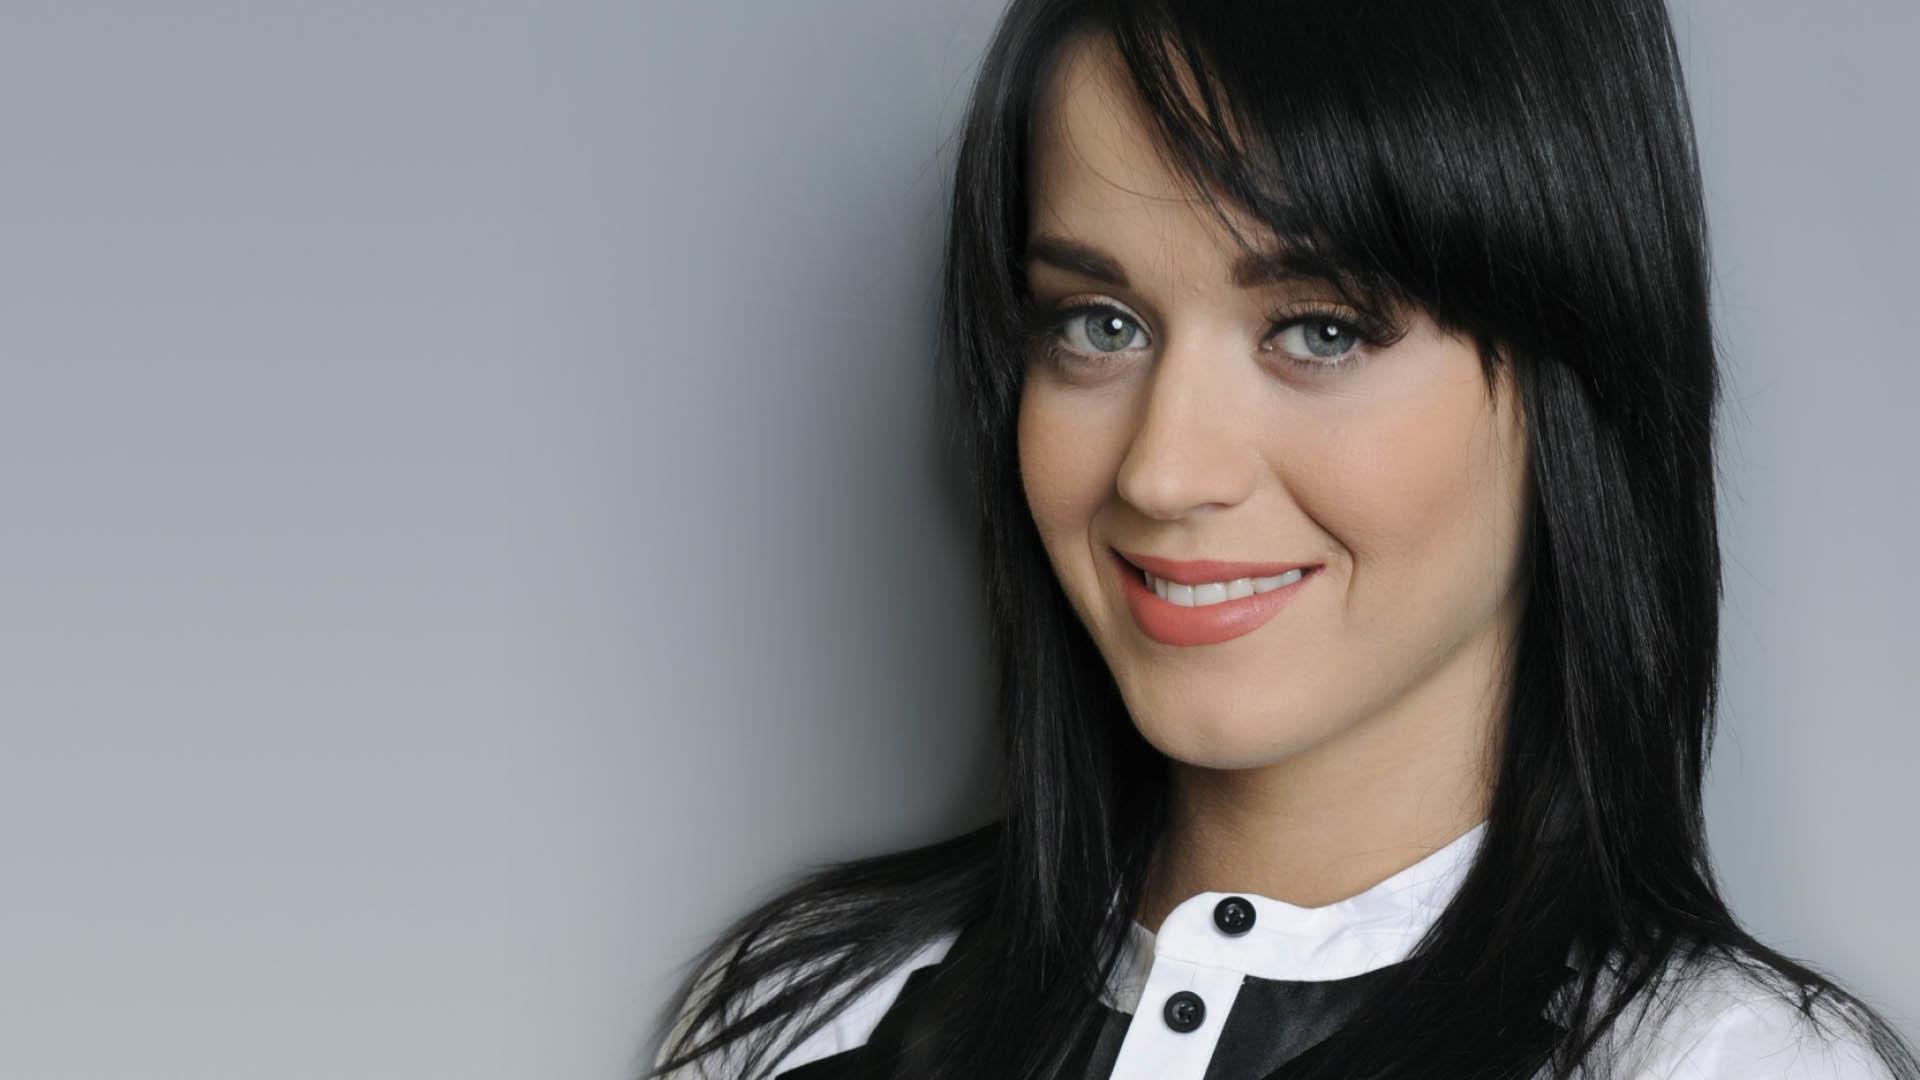 Simple Katy Perry Desktop Background. Download …